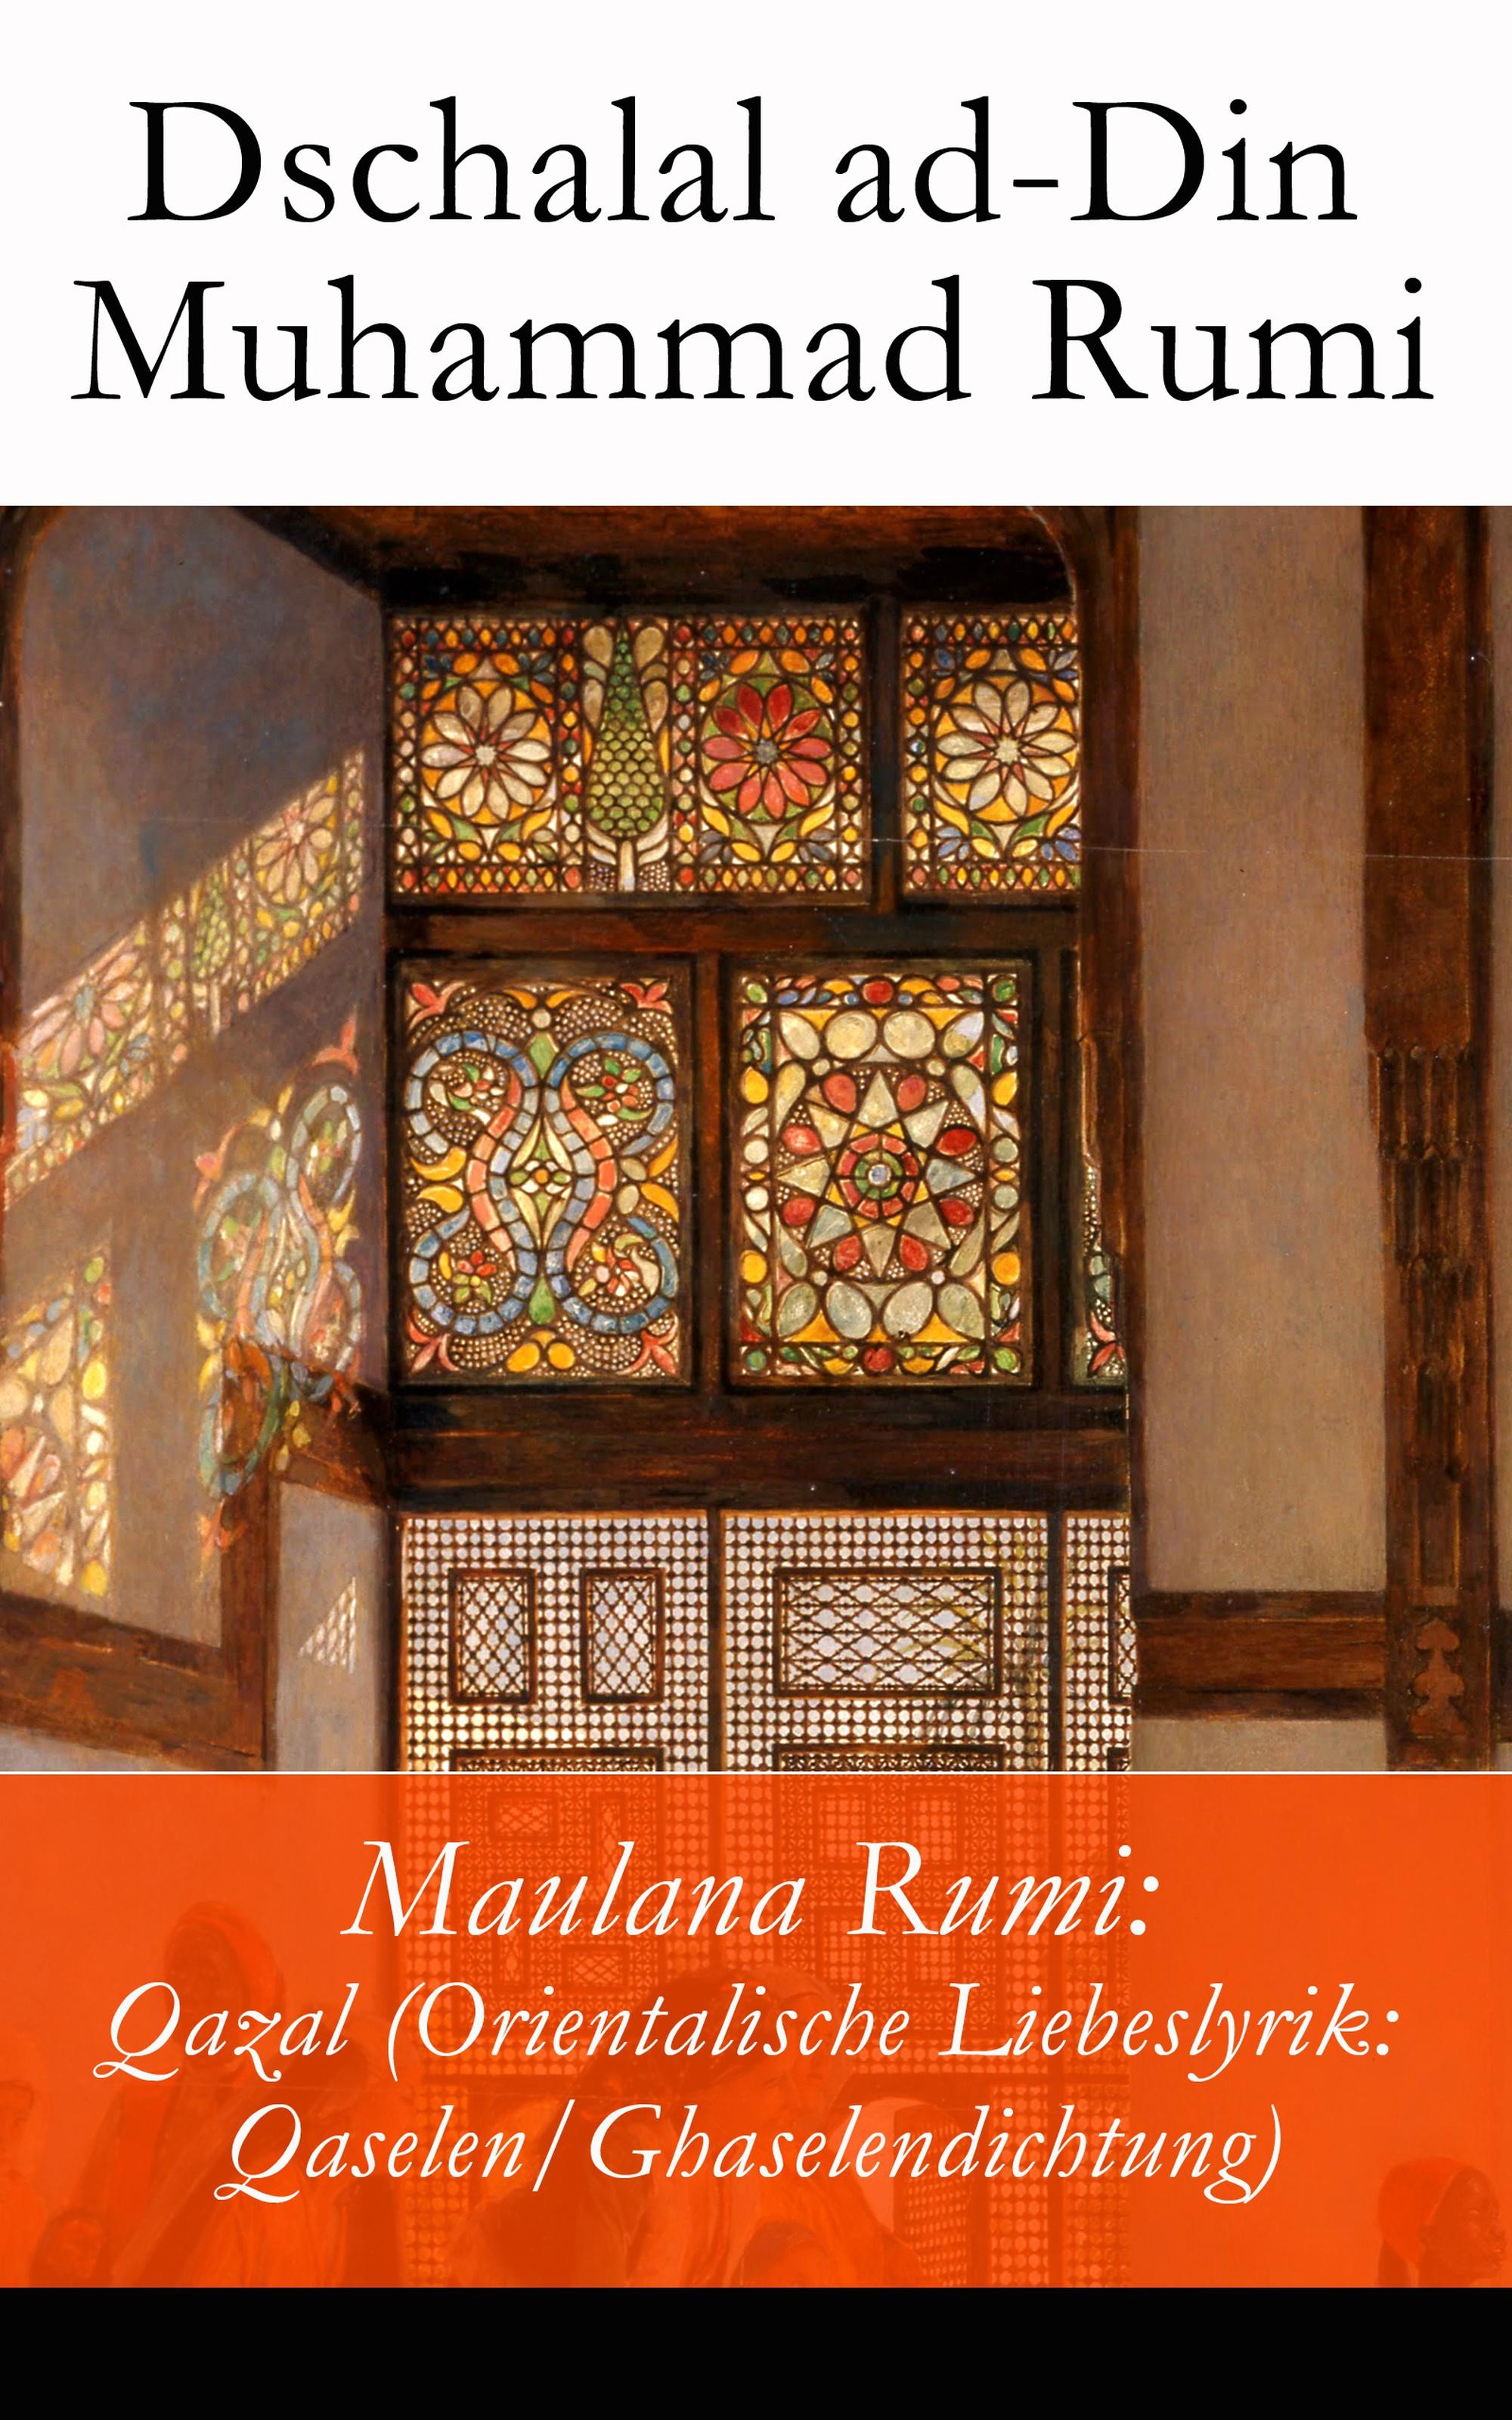 Dschalal ad-Din Muhammad Rumi Maulana Rumi: Qazal (Orientalische Liebeslyrik: Qaselen/Ghaselendichtung)